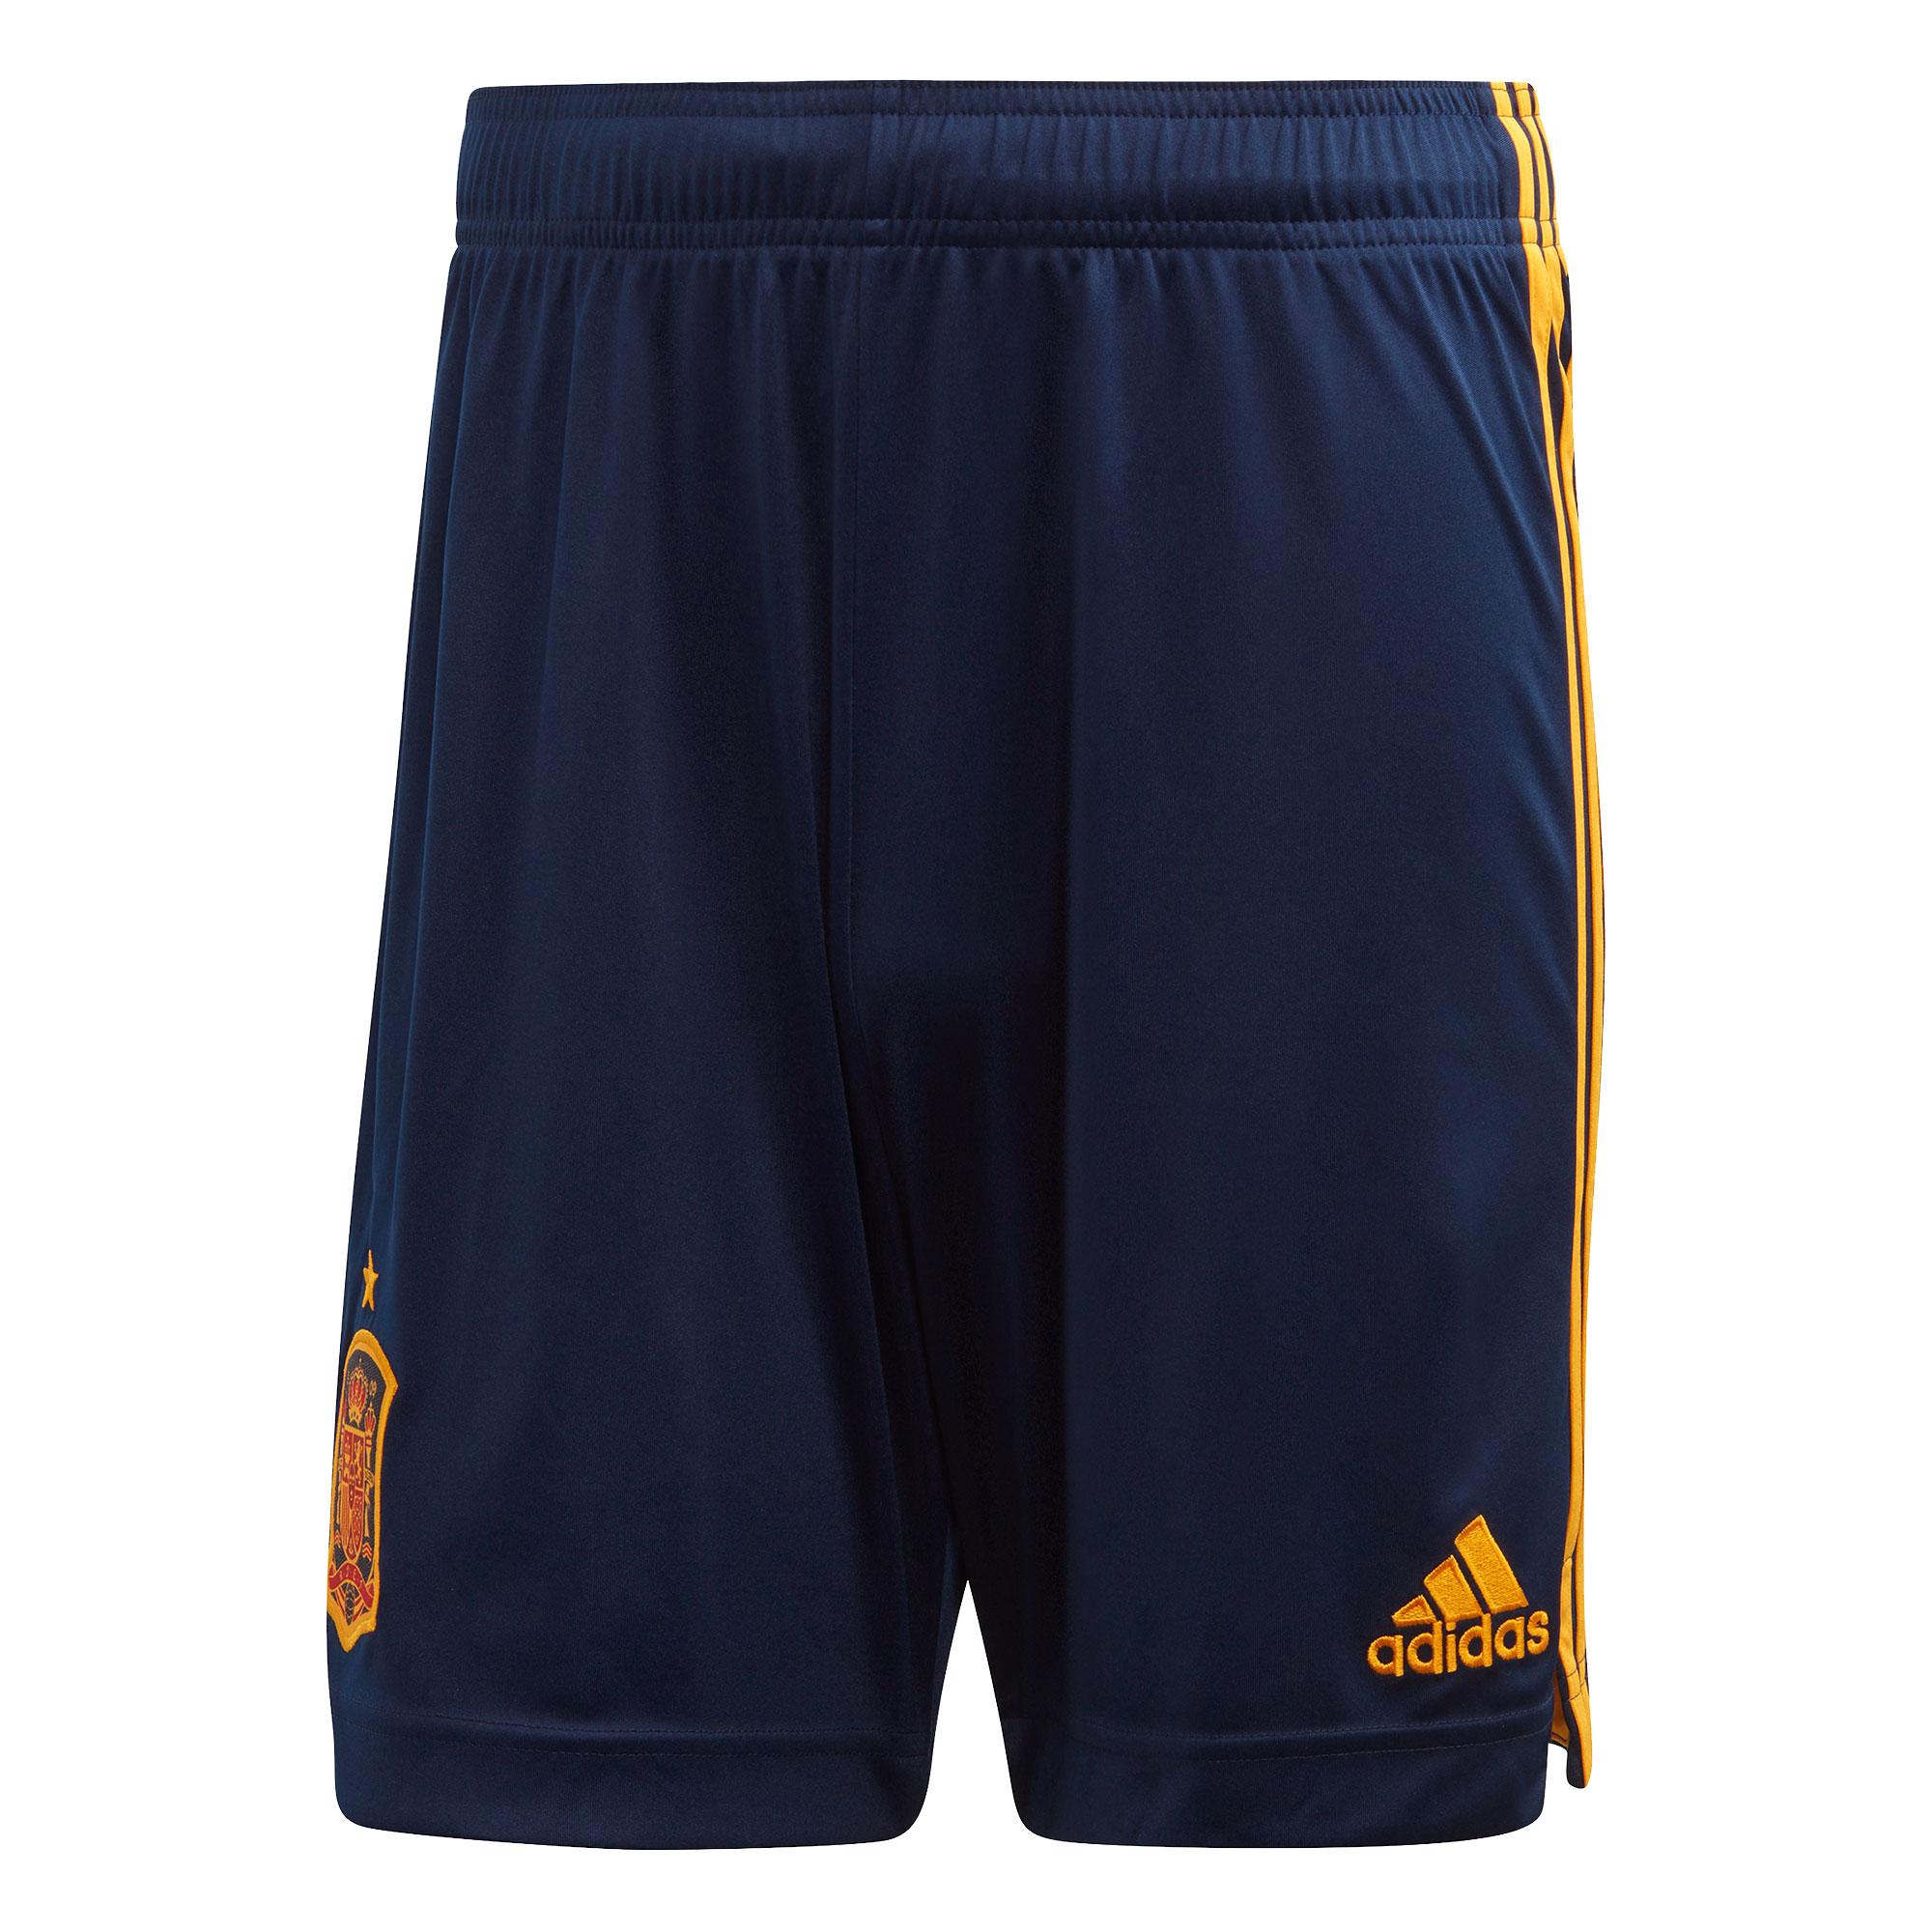 Spain Home Shorts 2019-21